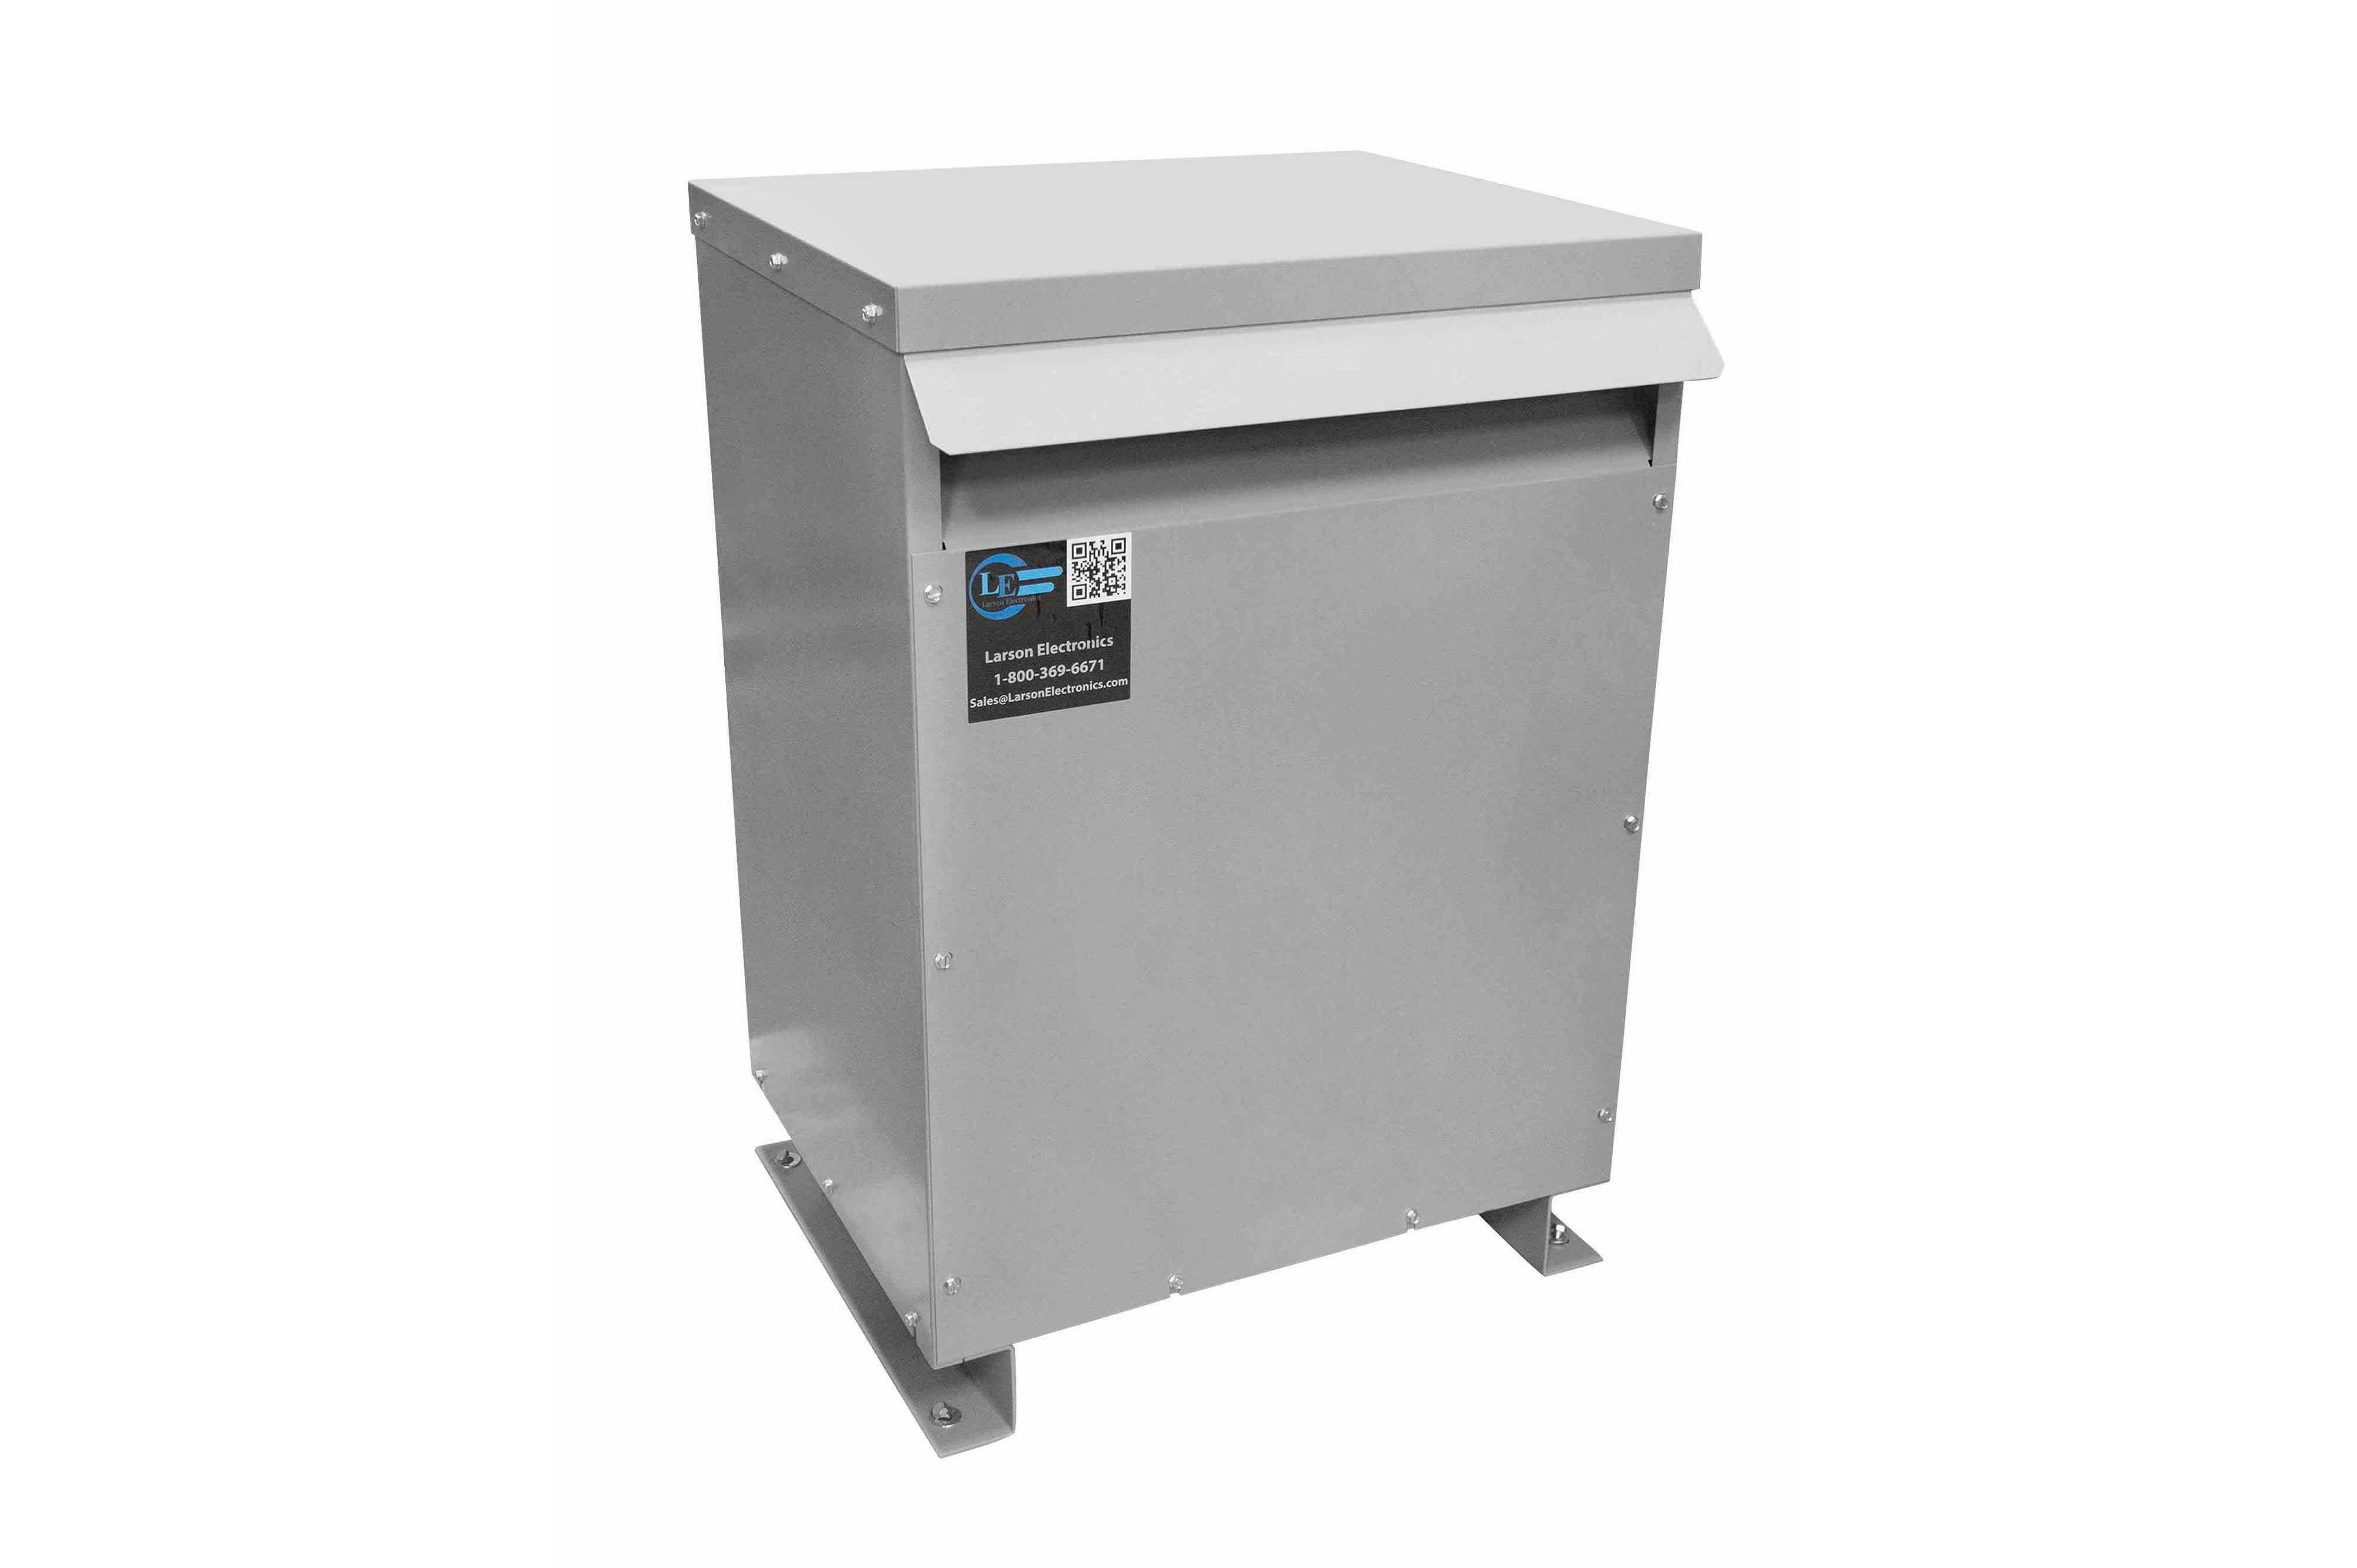 18 kVA 3PH Isolation Transformer, 380V Wye Primary, 600V Delta Secondary, N3R, Ventilated, 60 Hz